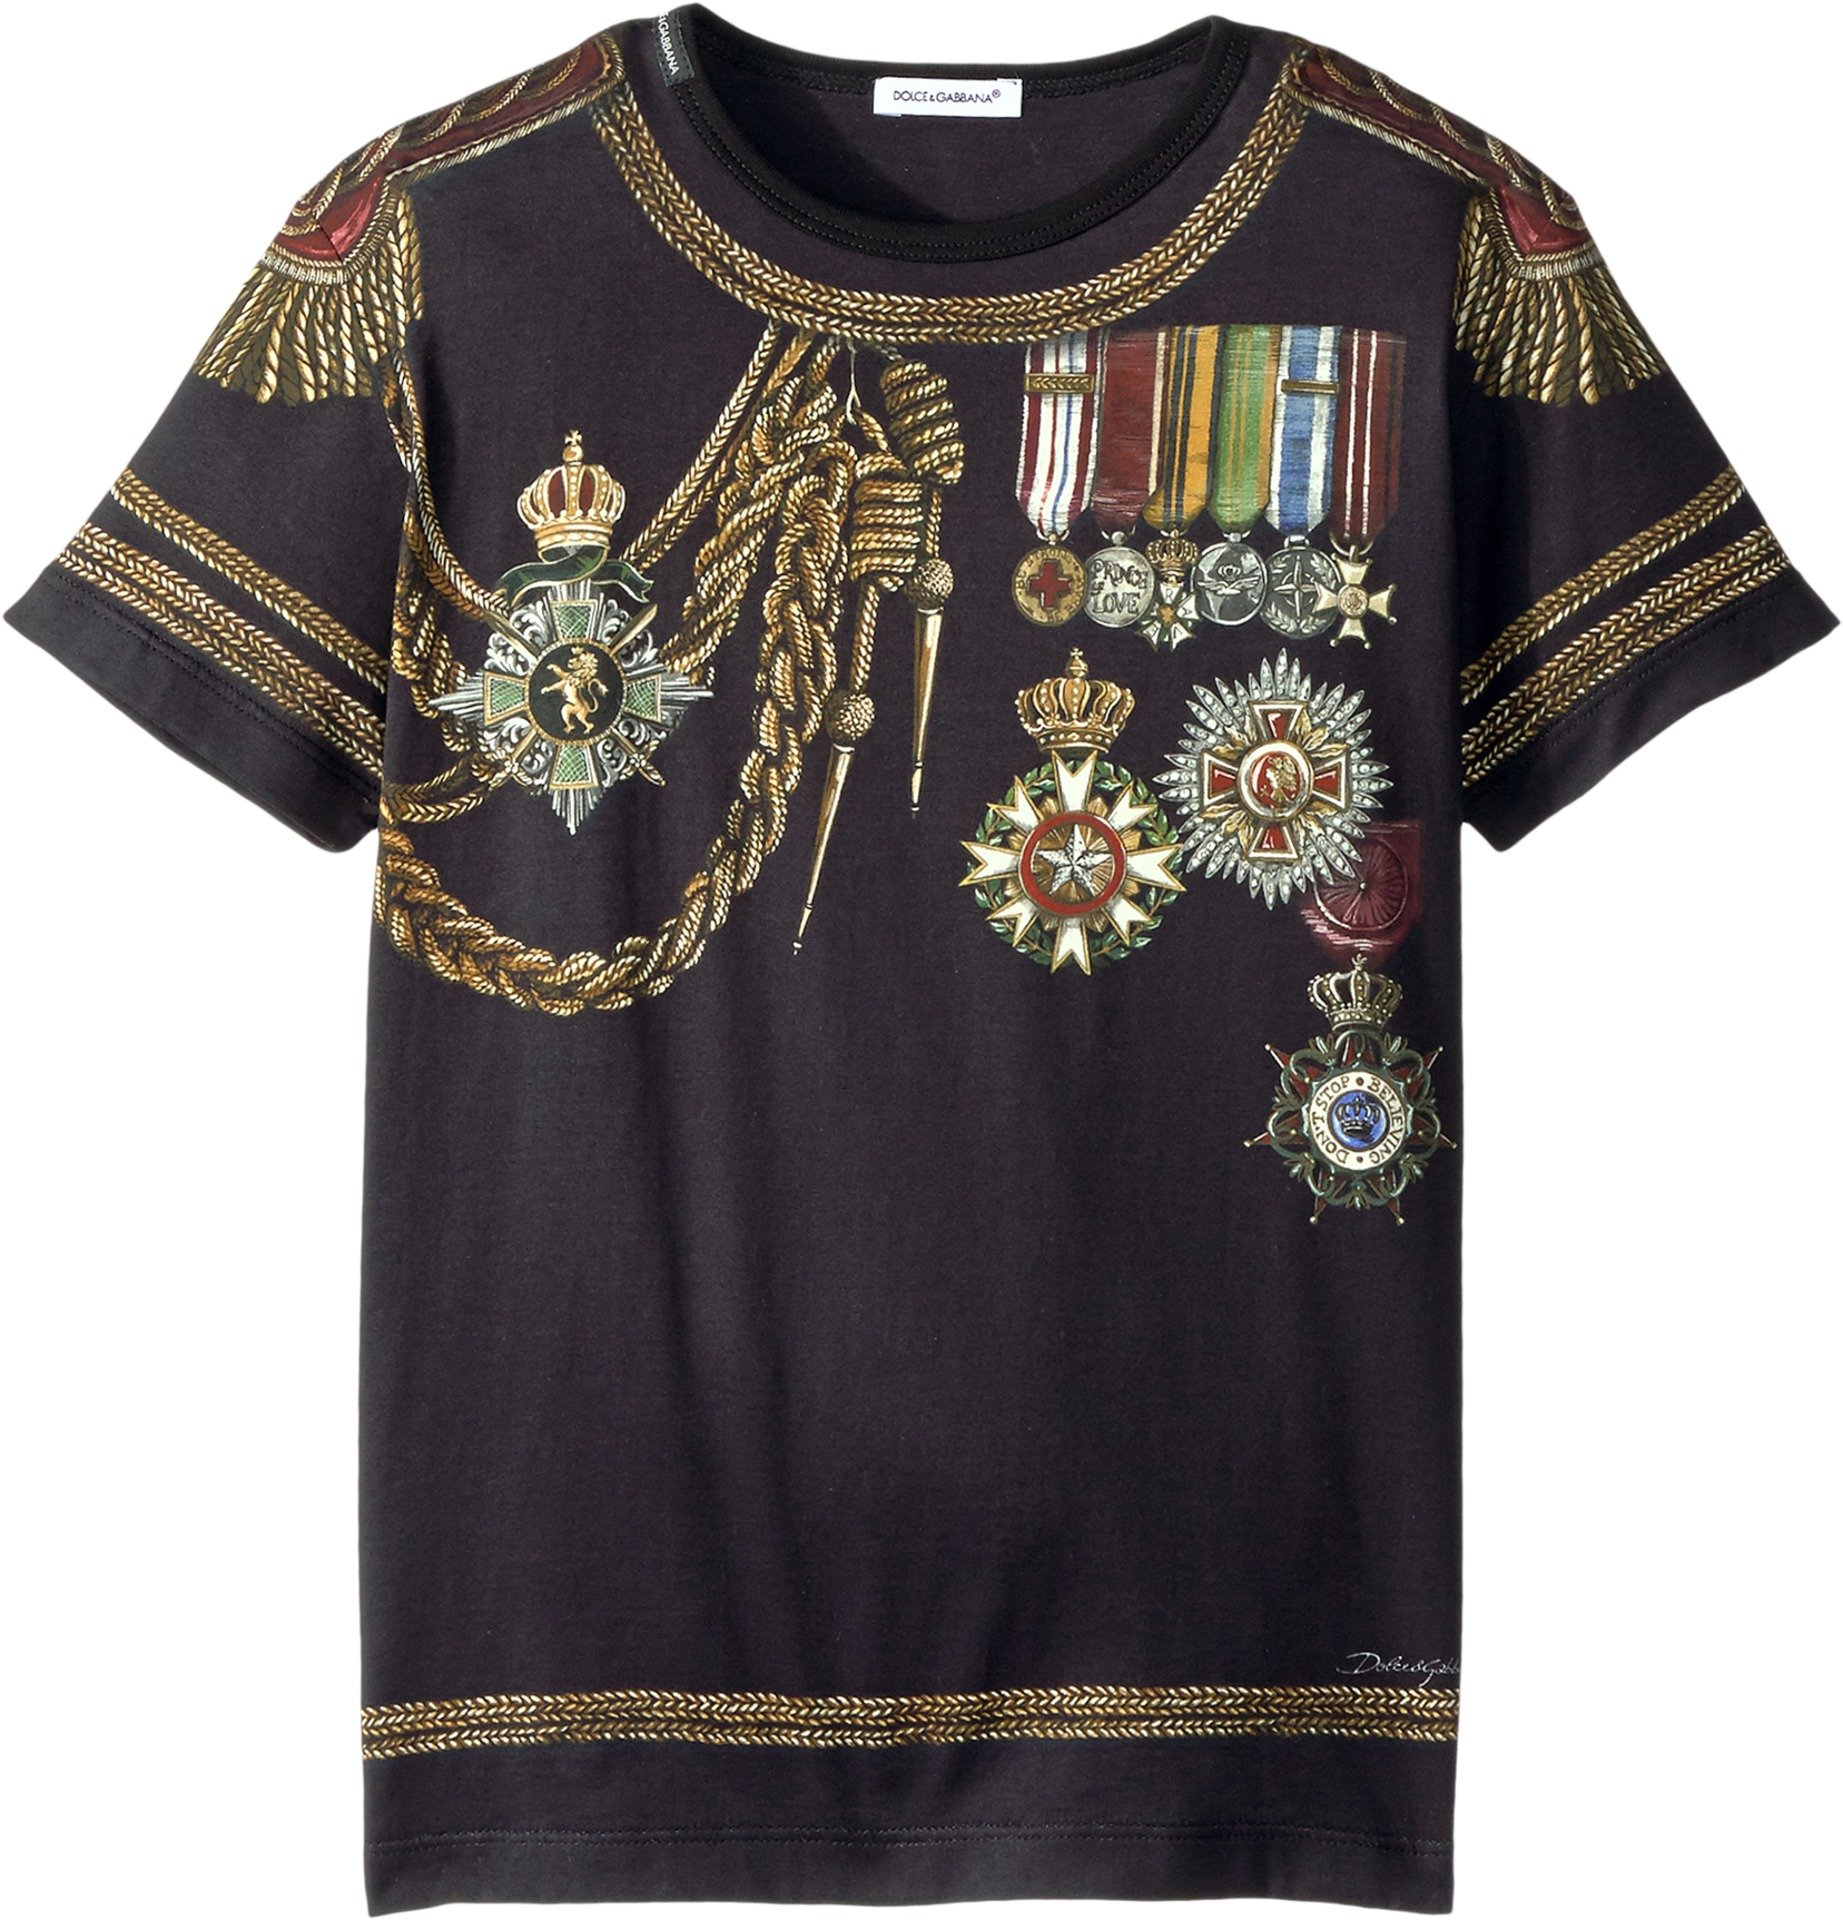 Dolce & Gabbana Kids  Boy's Medallion T-Shirt (Big Kids) Black 8 by Dolce & Gabbana